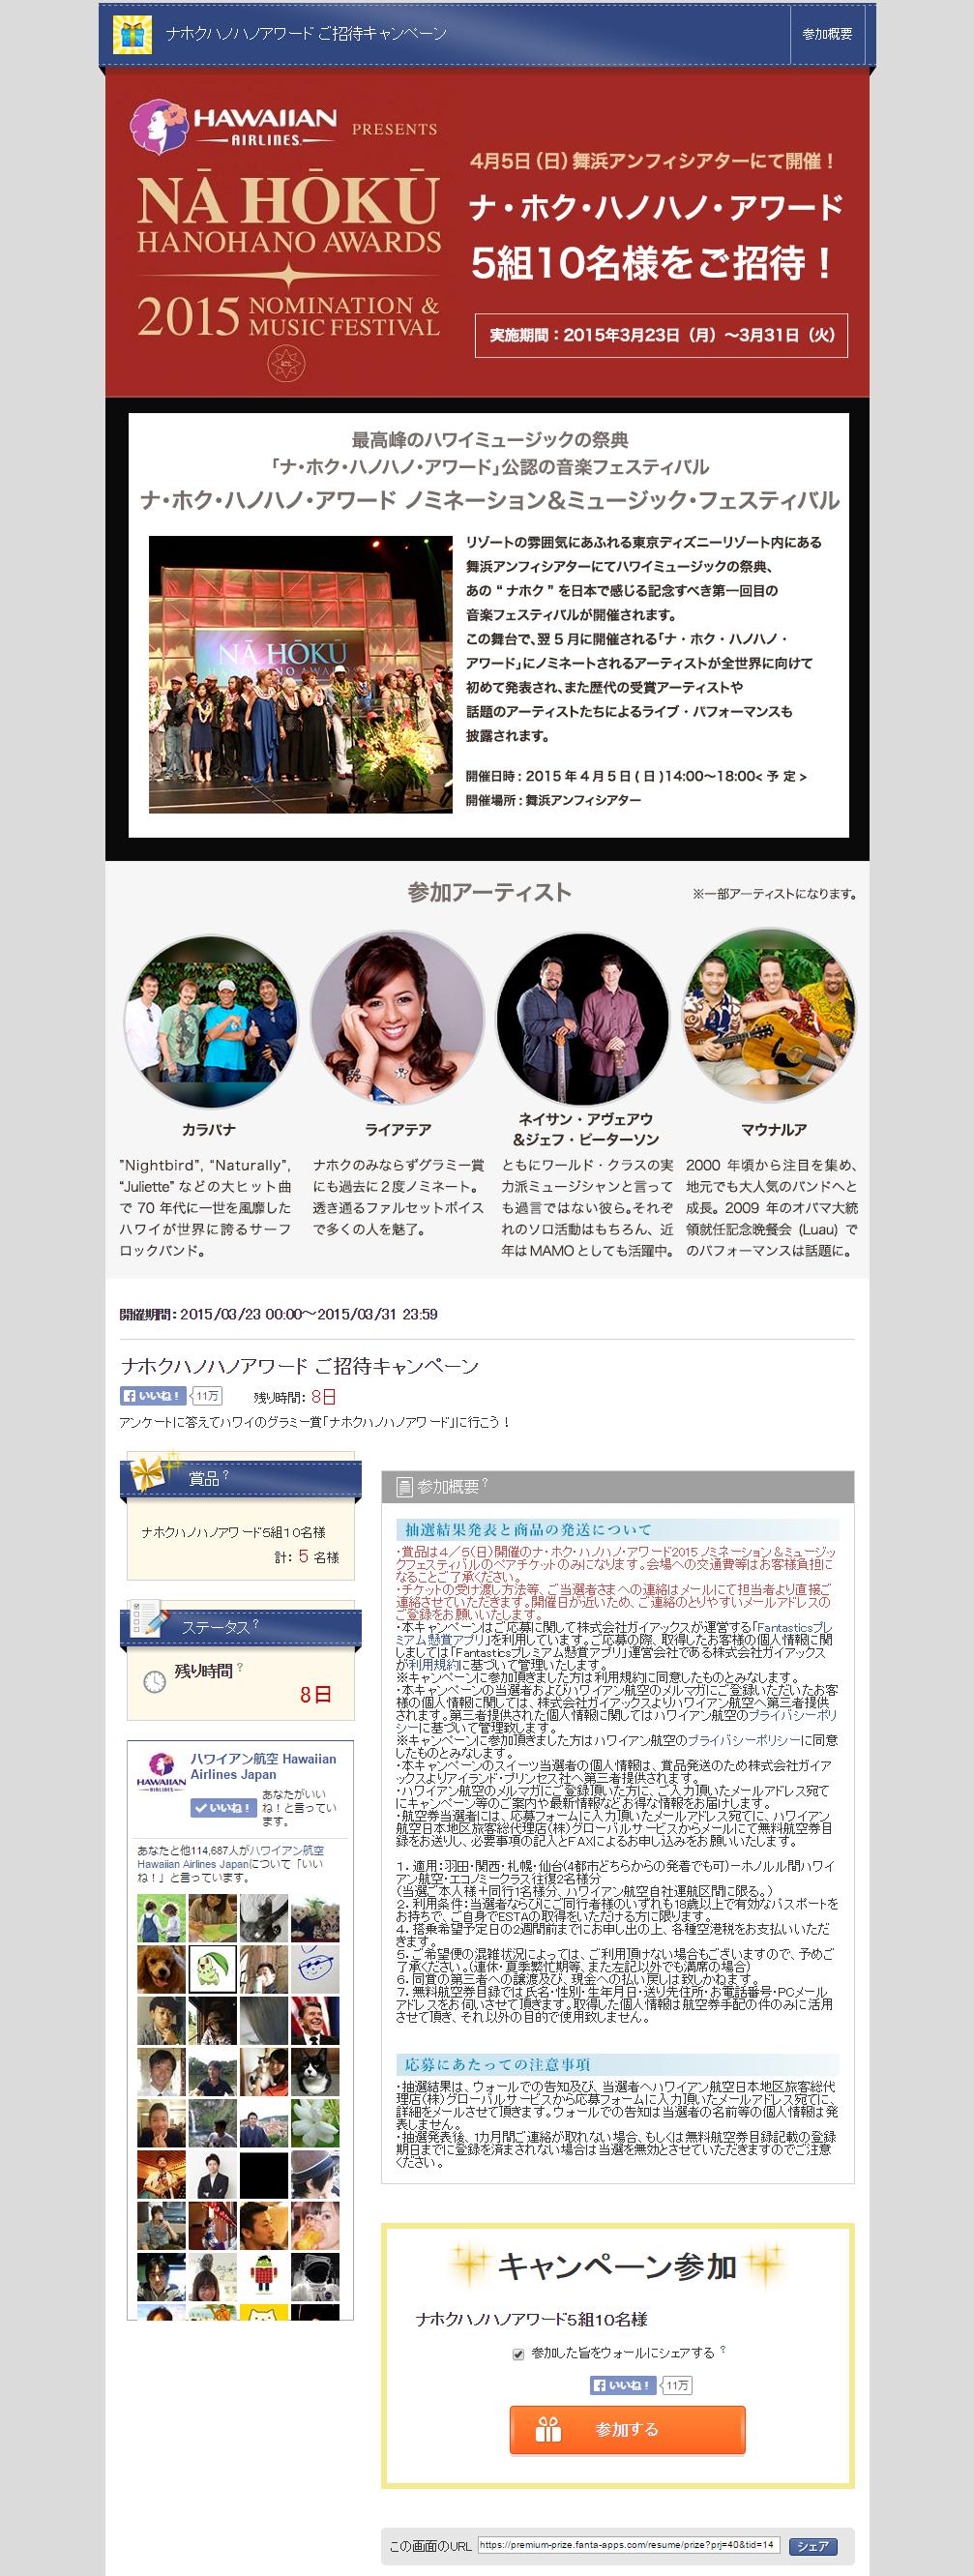 Fantastics懸賞アプリ(ハワイアン航空様)